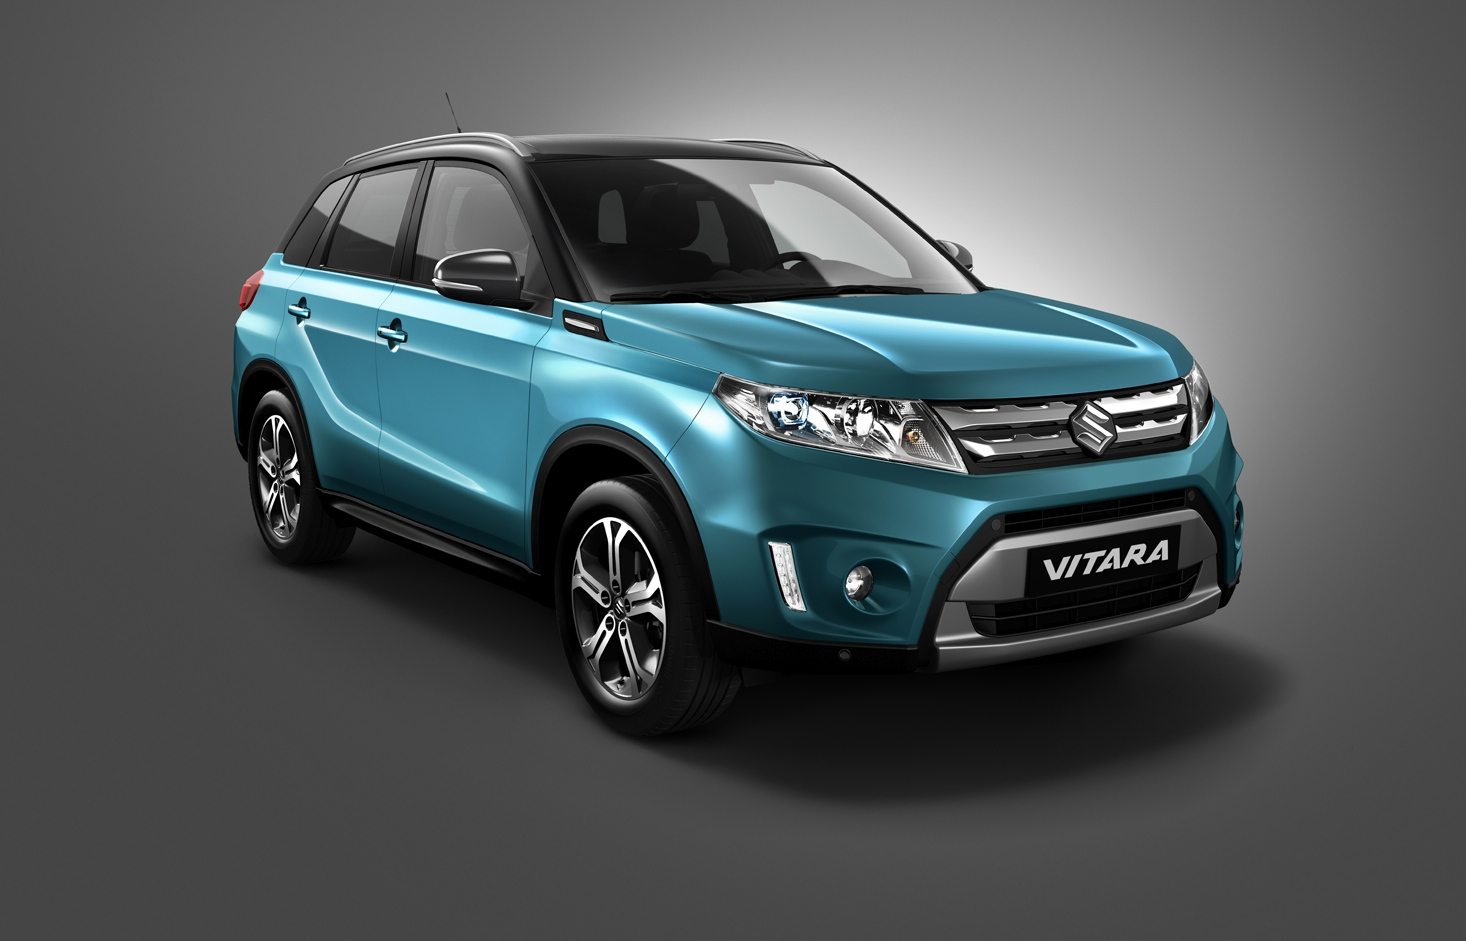 Suzuki løfter sløret for ny Vitara